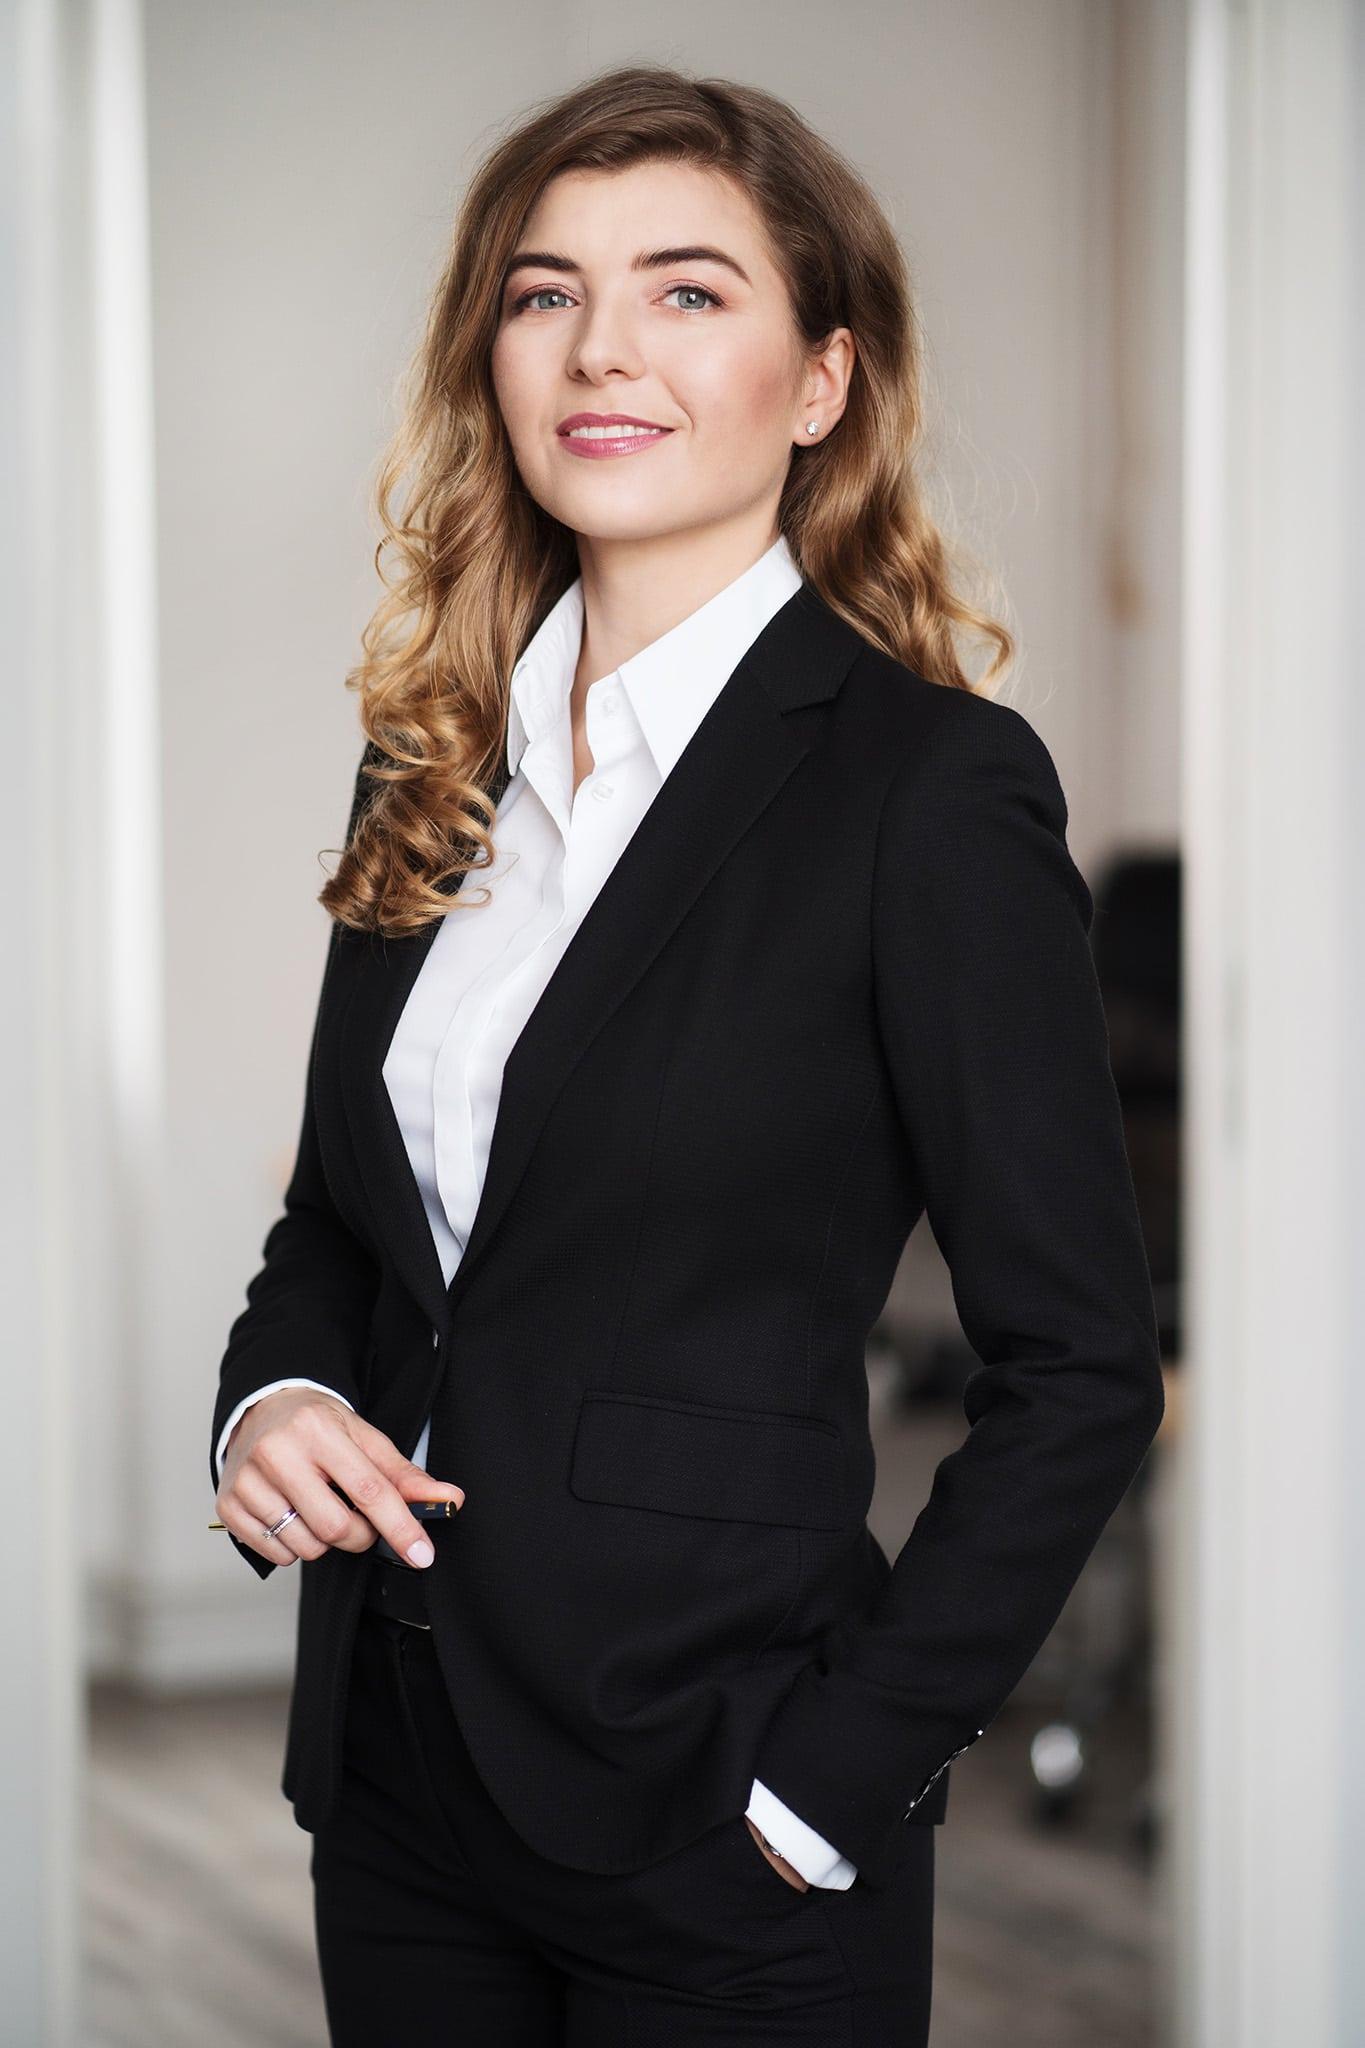 Sesja do CV  – Ania